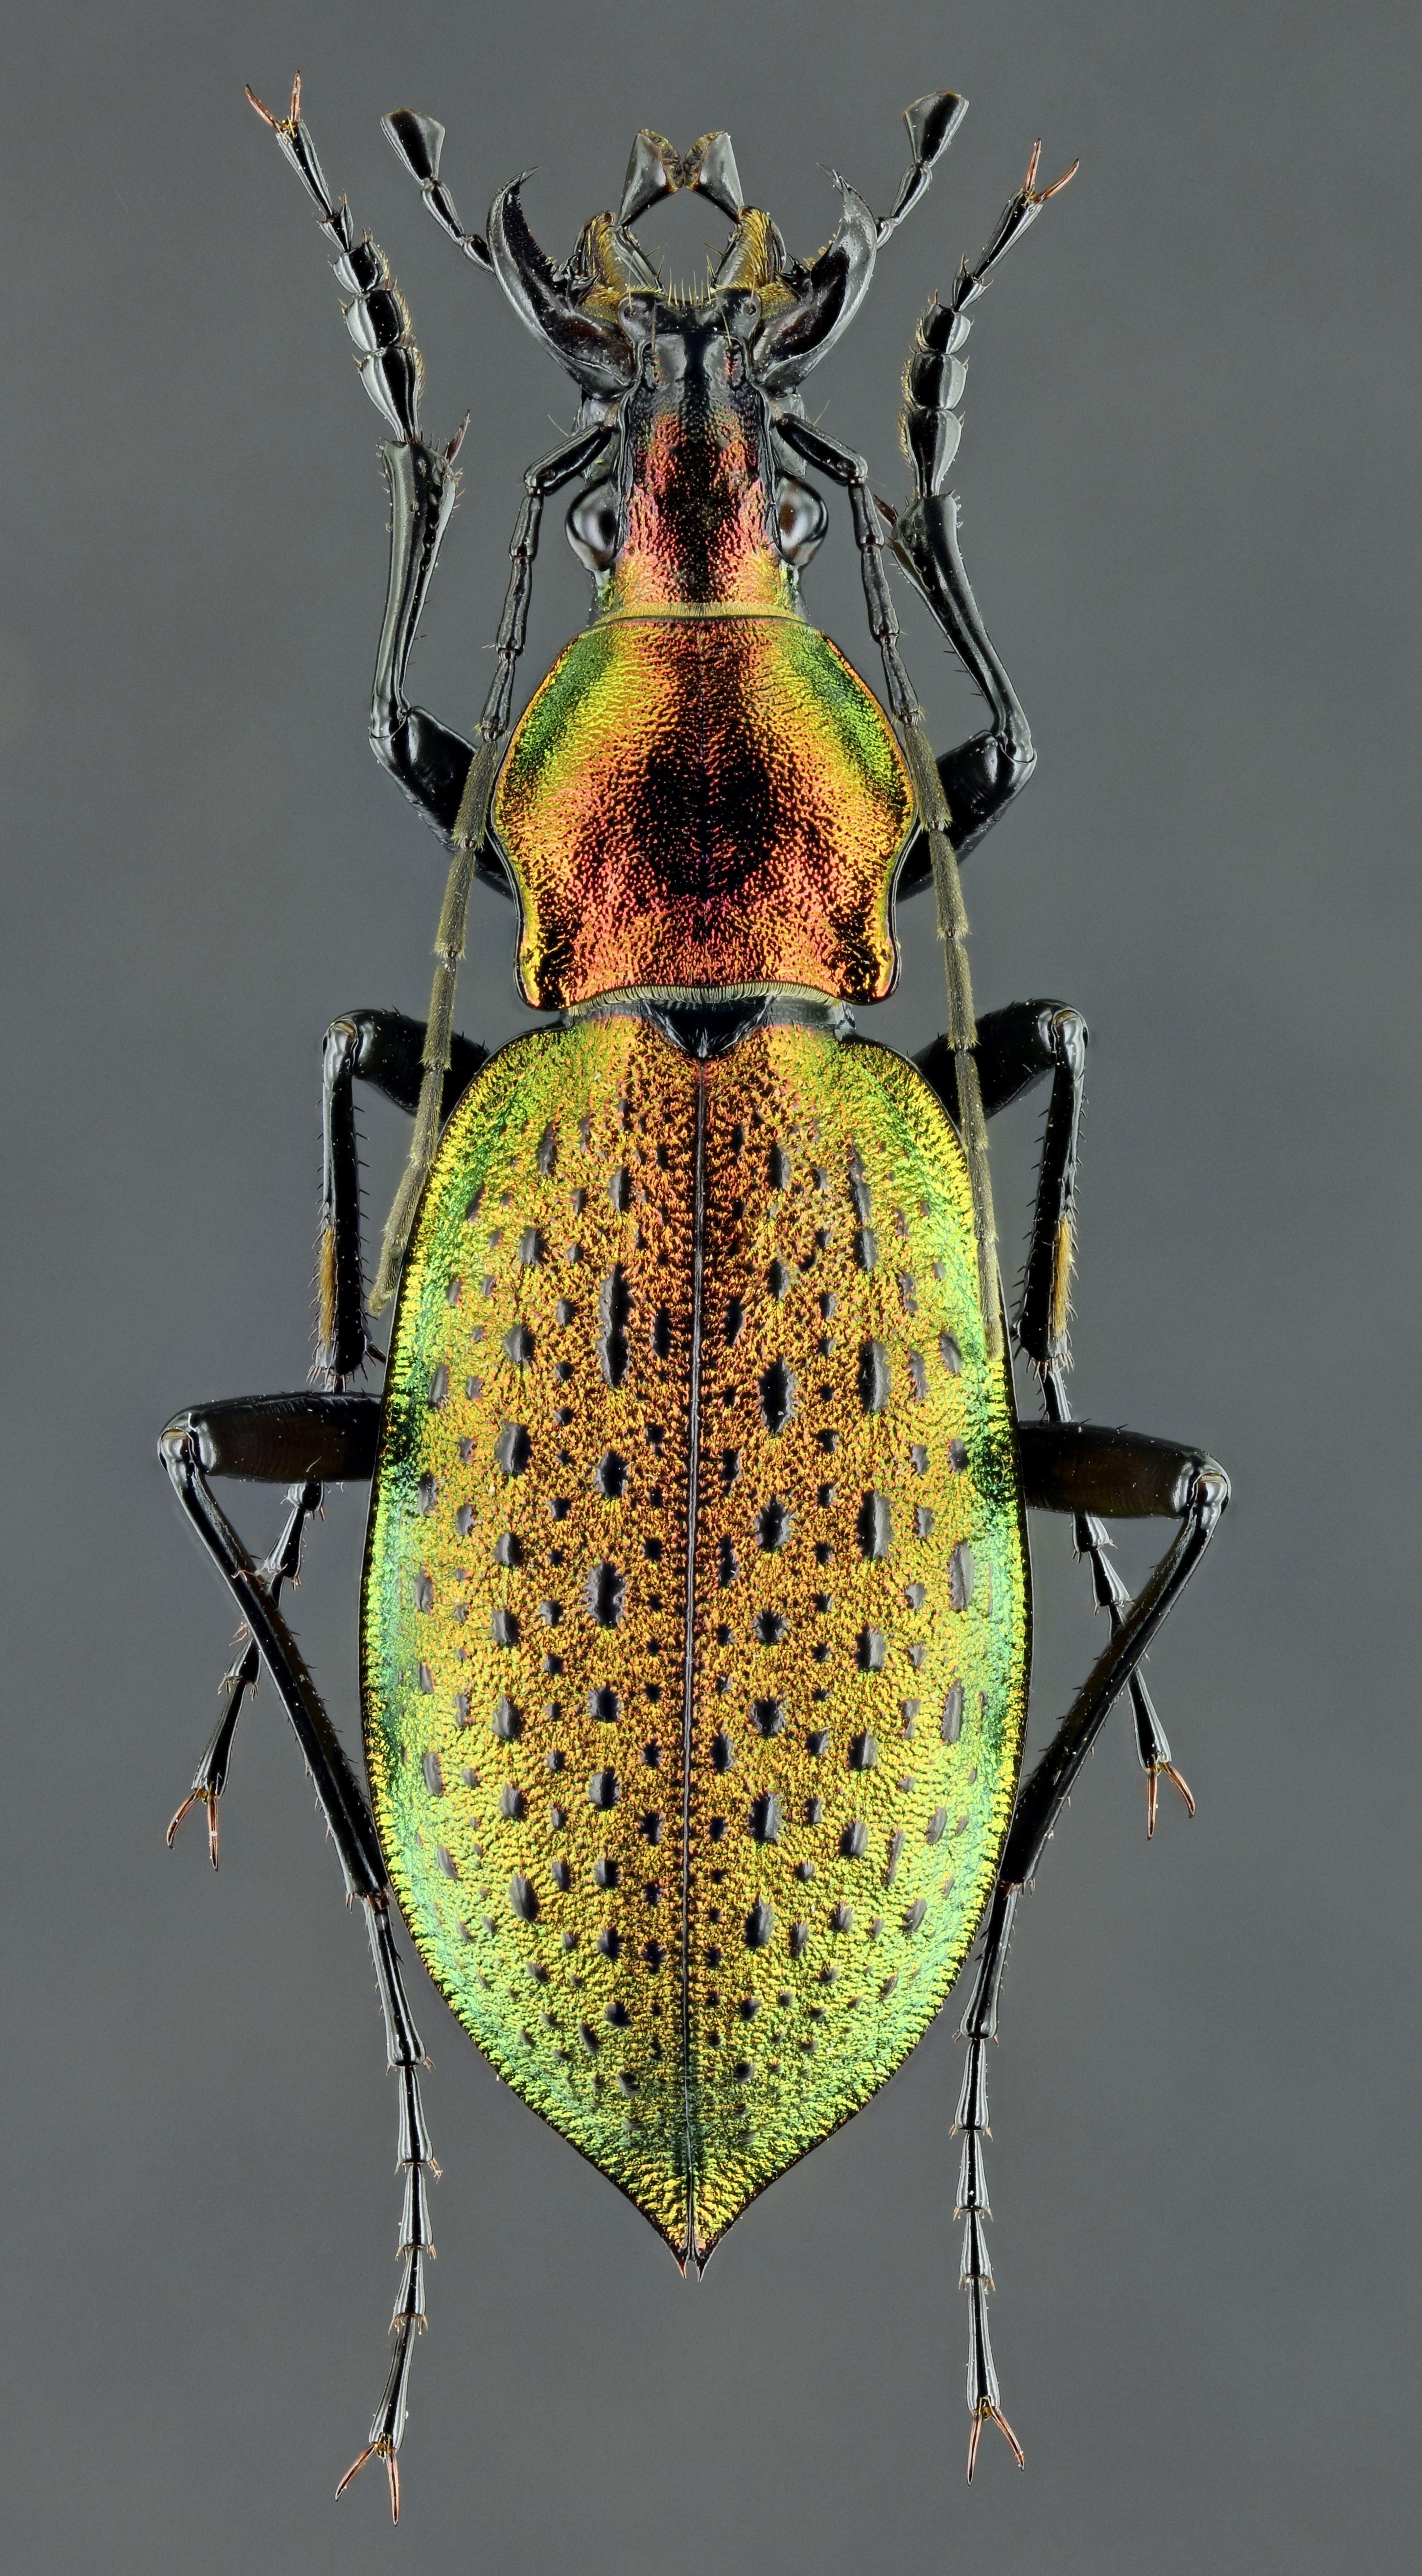 Coptolabrus smaragdinus m 41118zs34.JPG